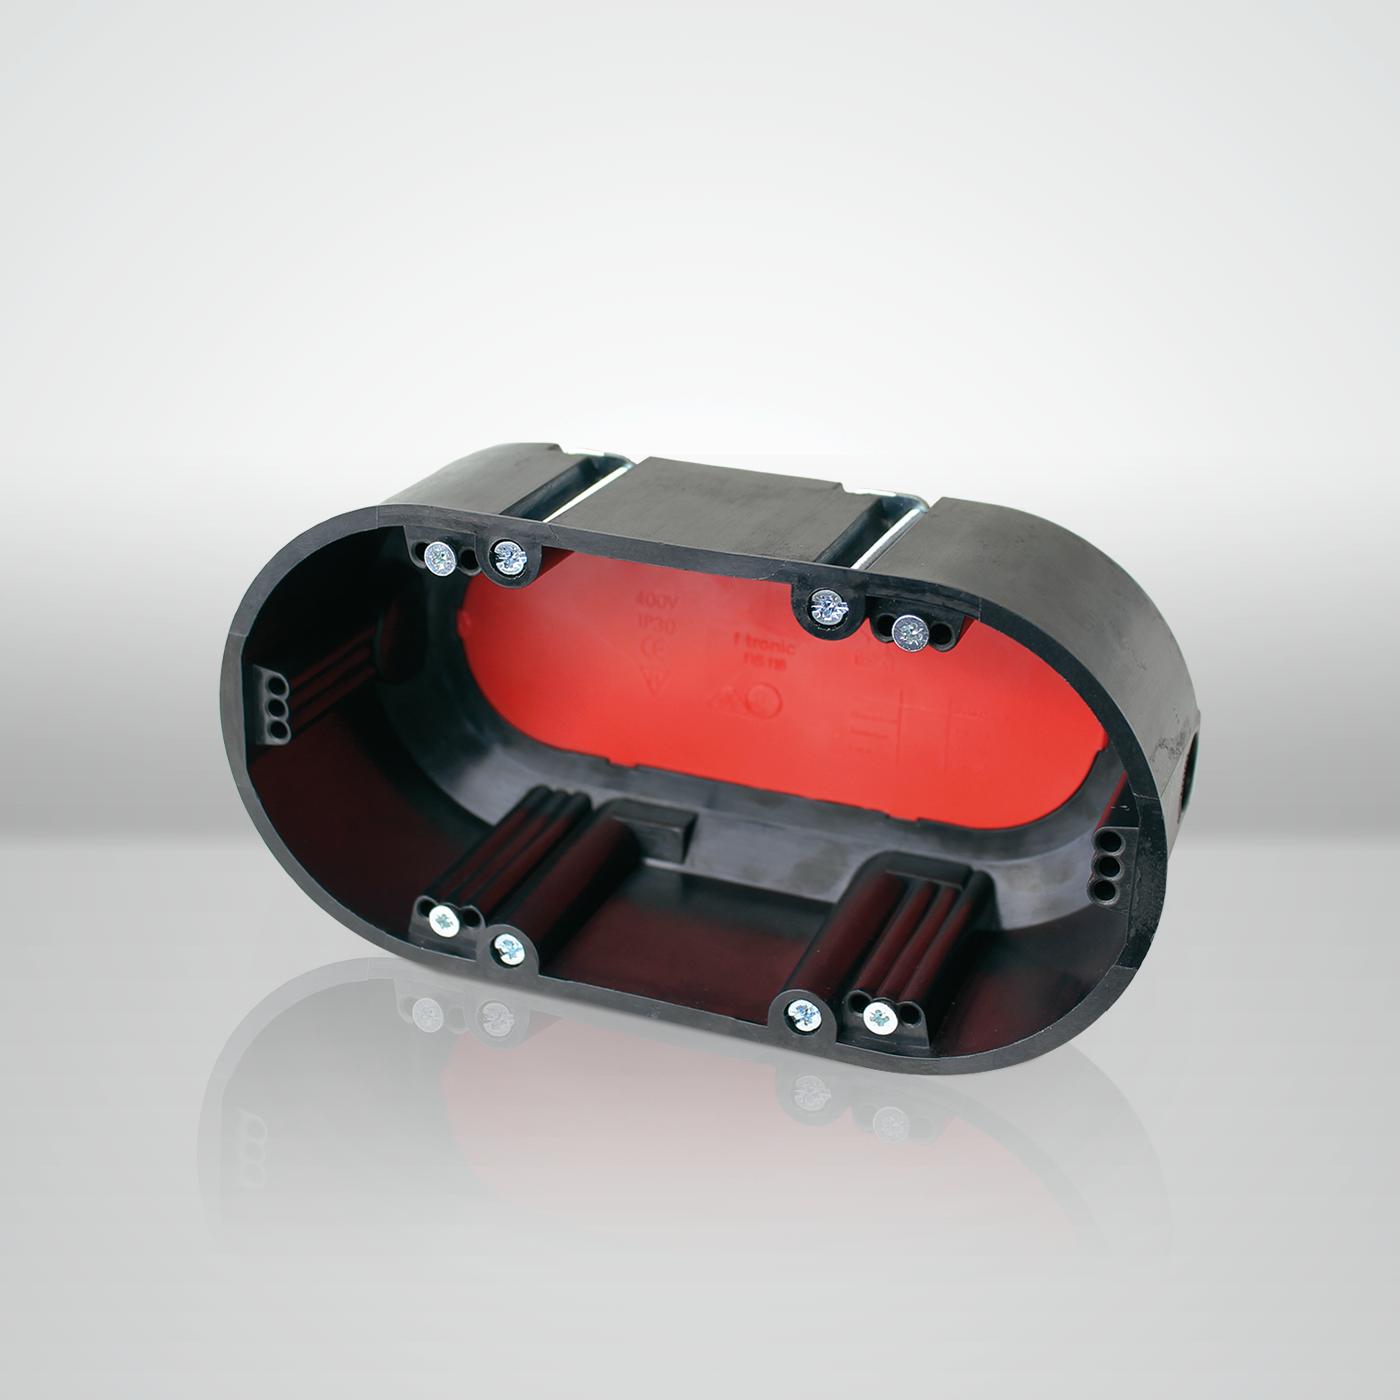 FLAMRO® Fire protection socket